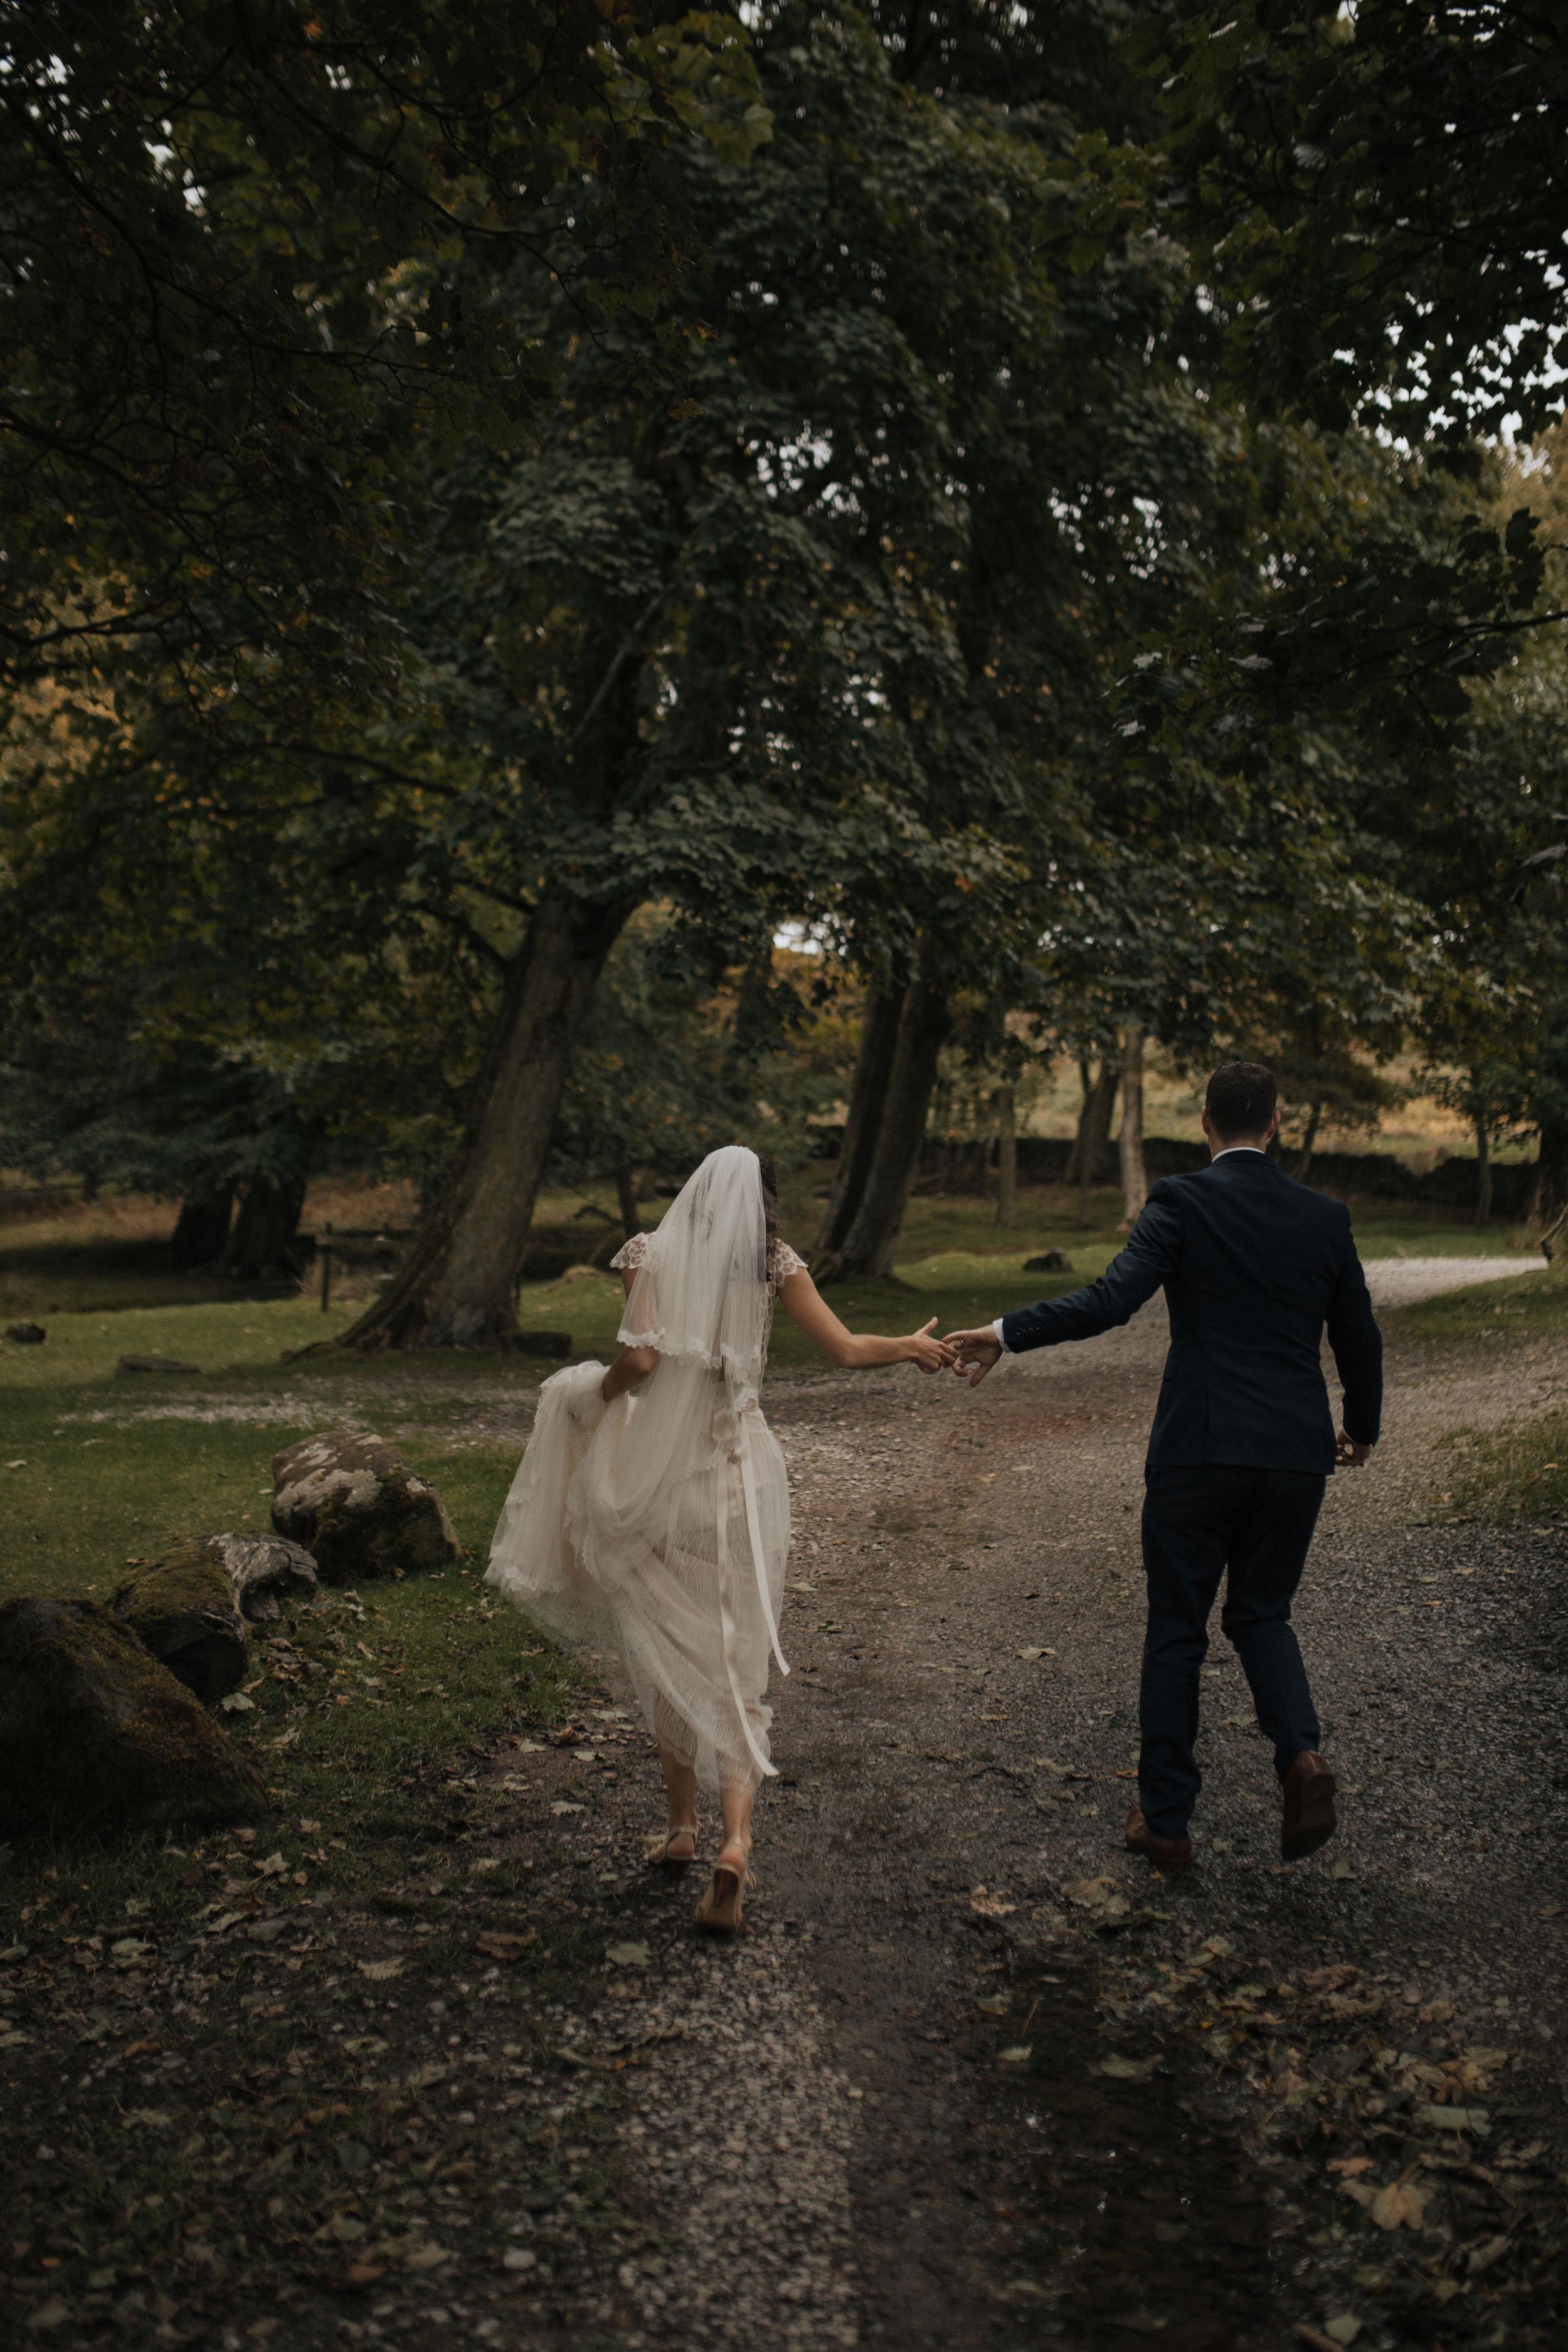 Joasia-Kate-Beaumont-Bohemian-Lace-Wedding-Dress-Peak-District-Sheffield-Wedding-20.jpg